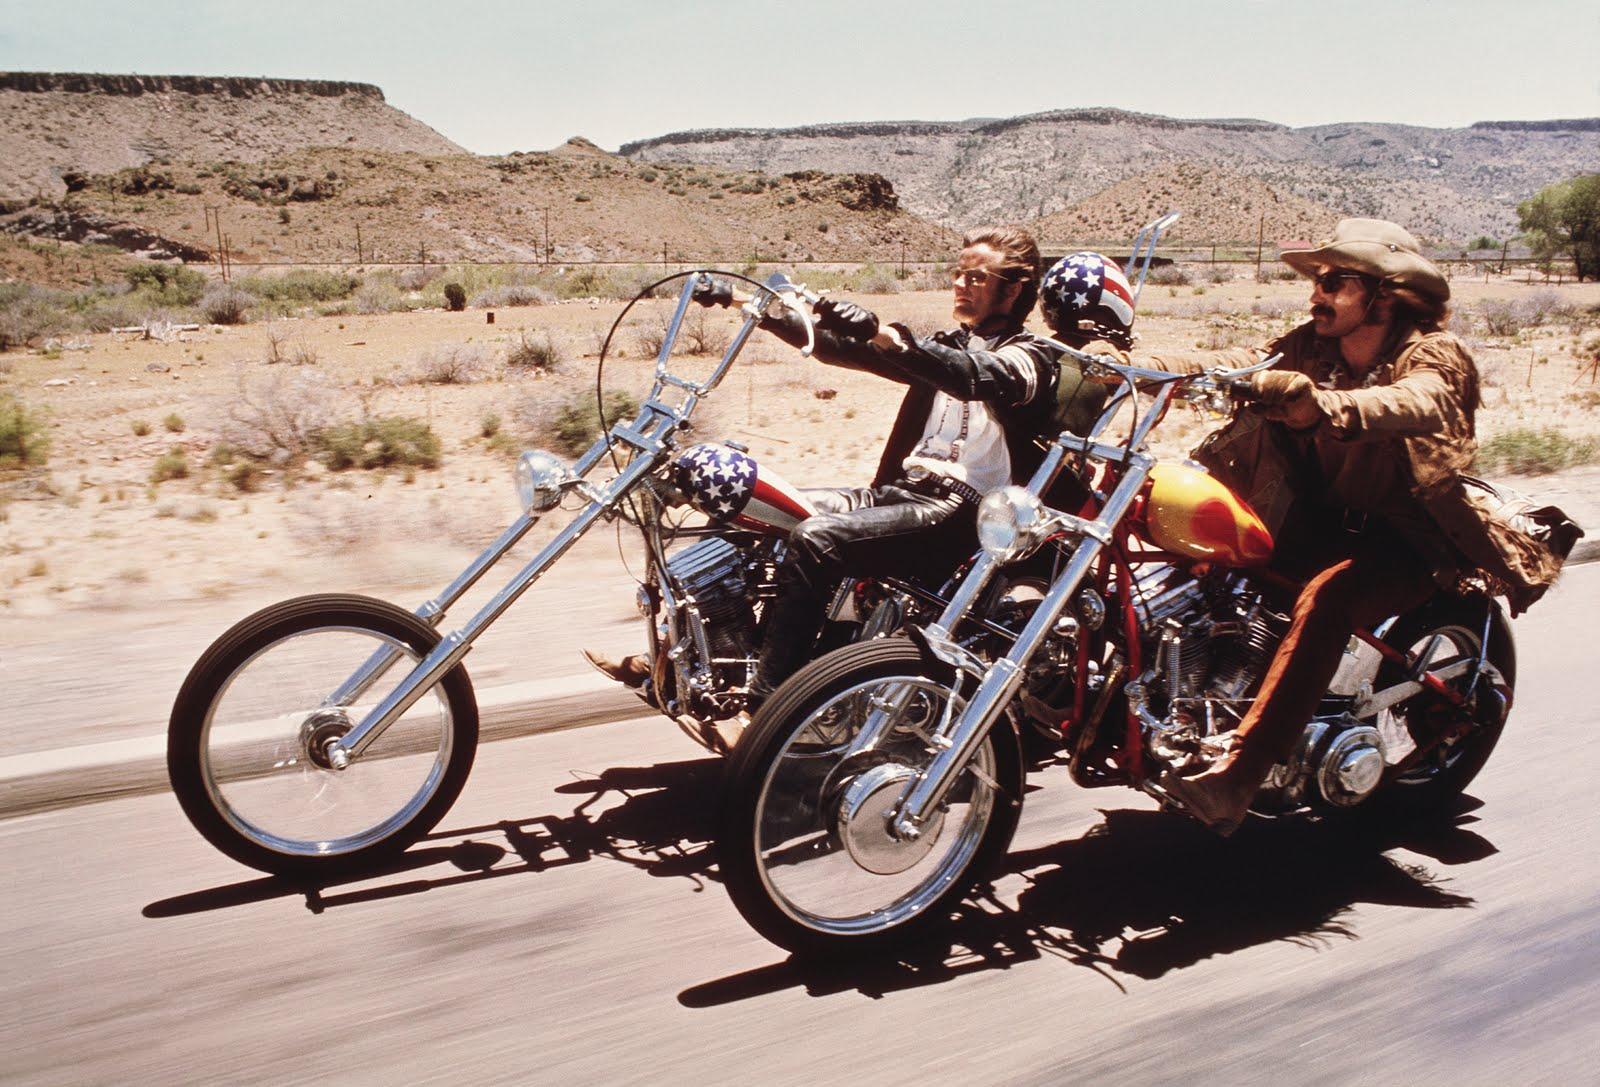 116. Easy Rider (1969)